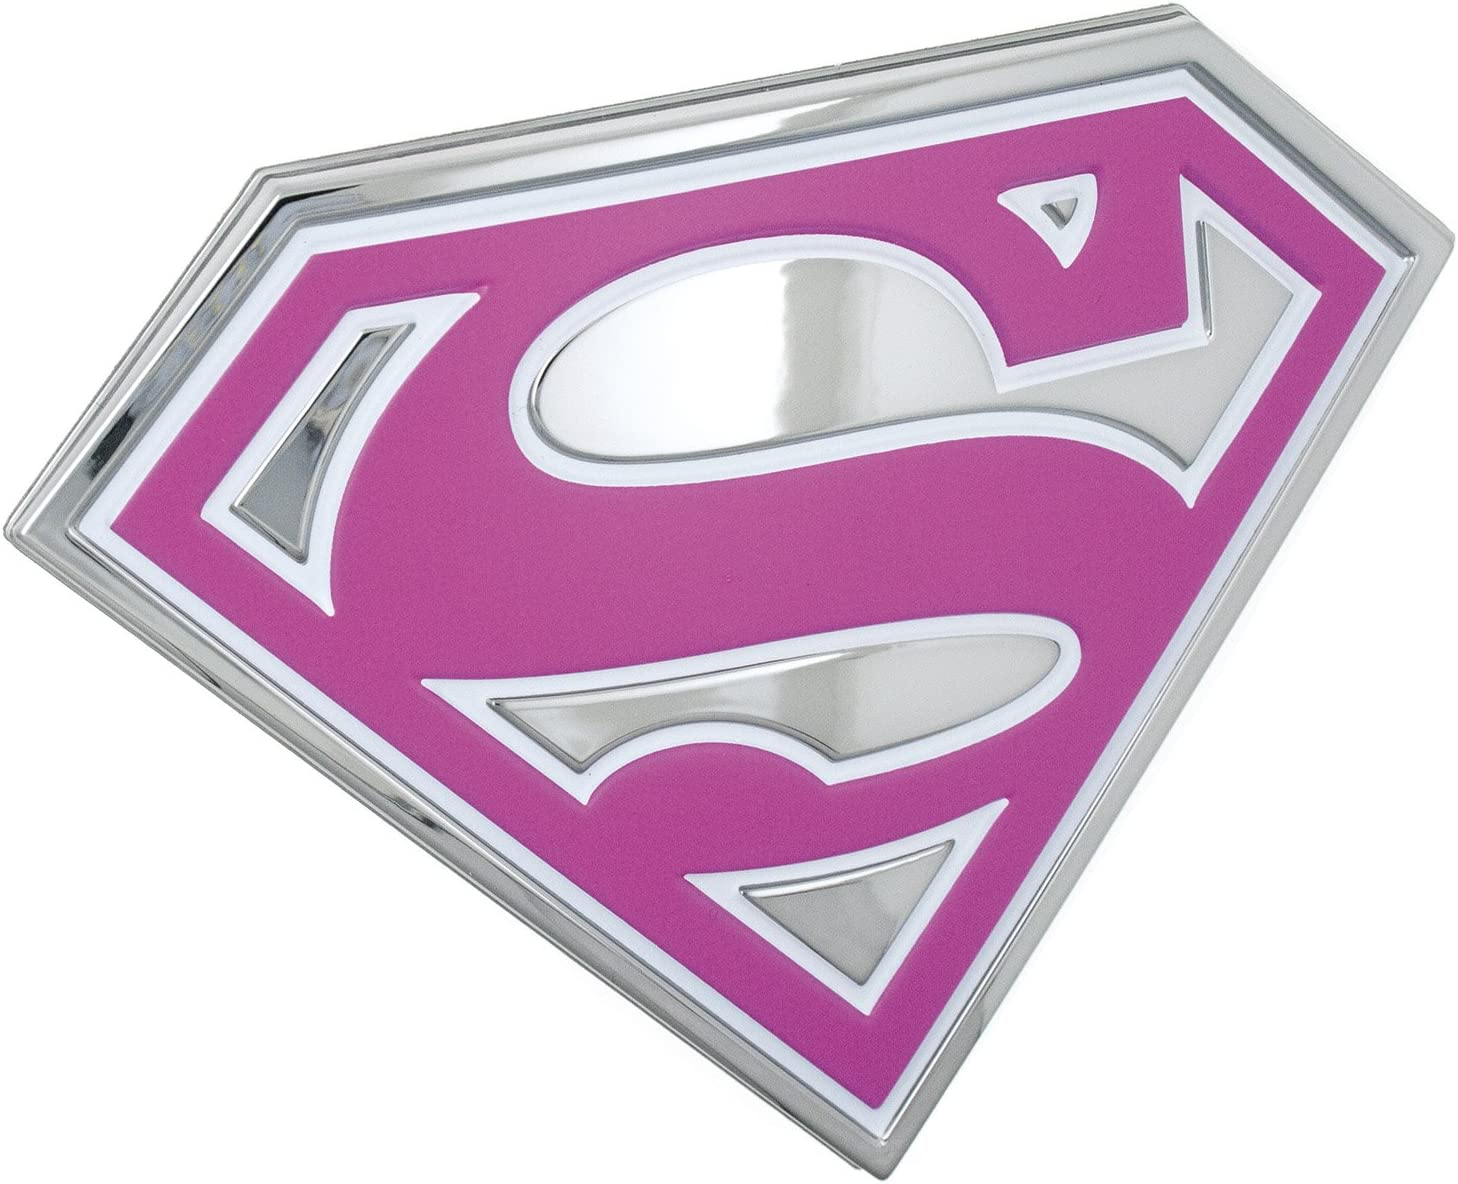 3D Chrome Metal Auto Car Motorcycle Superman Logo Sticker Badge Emblem Decal New